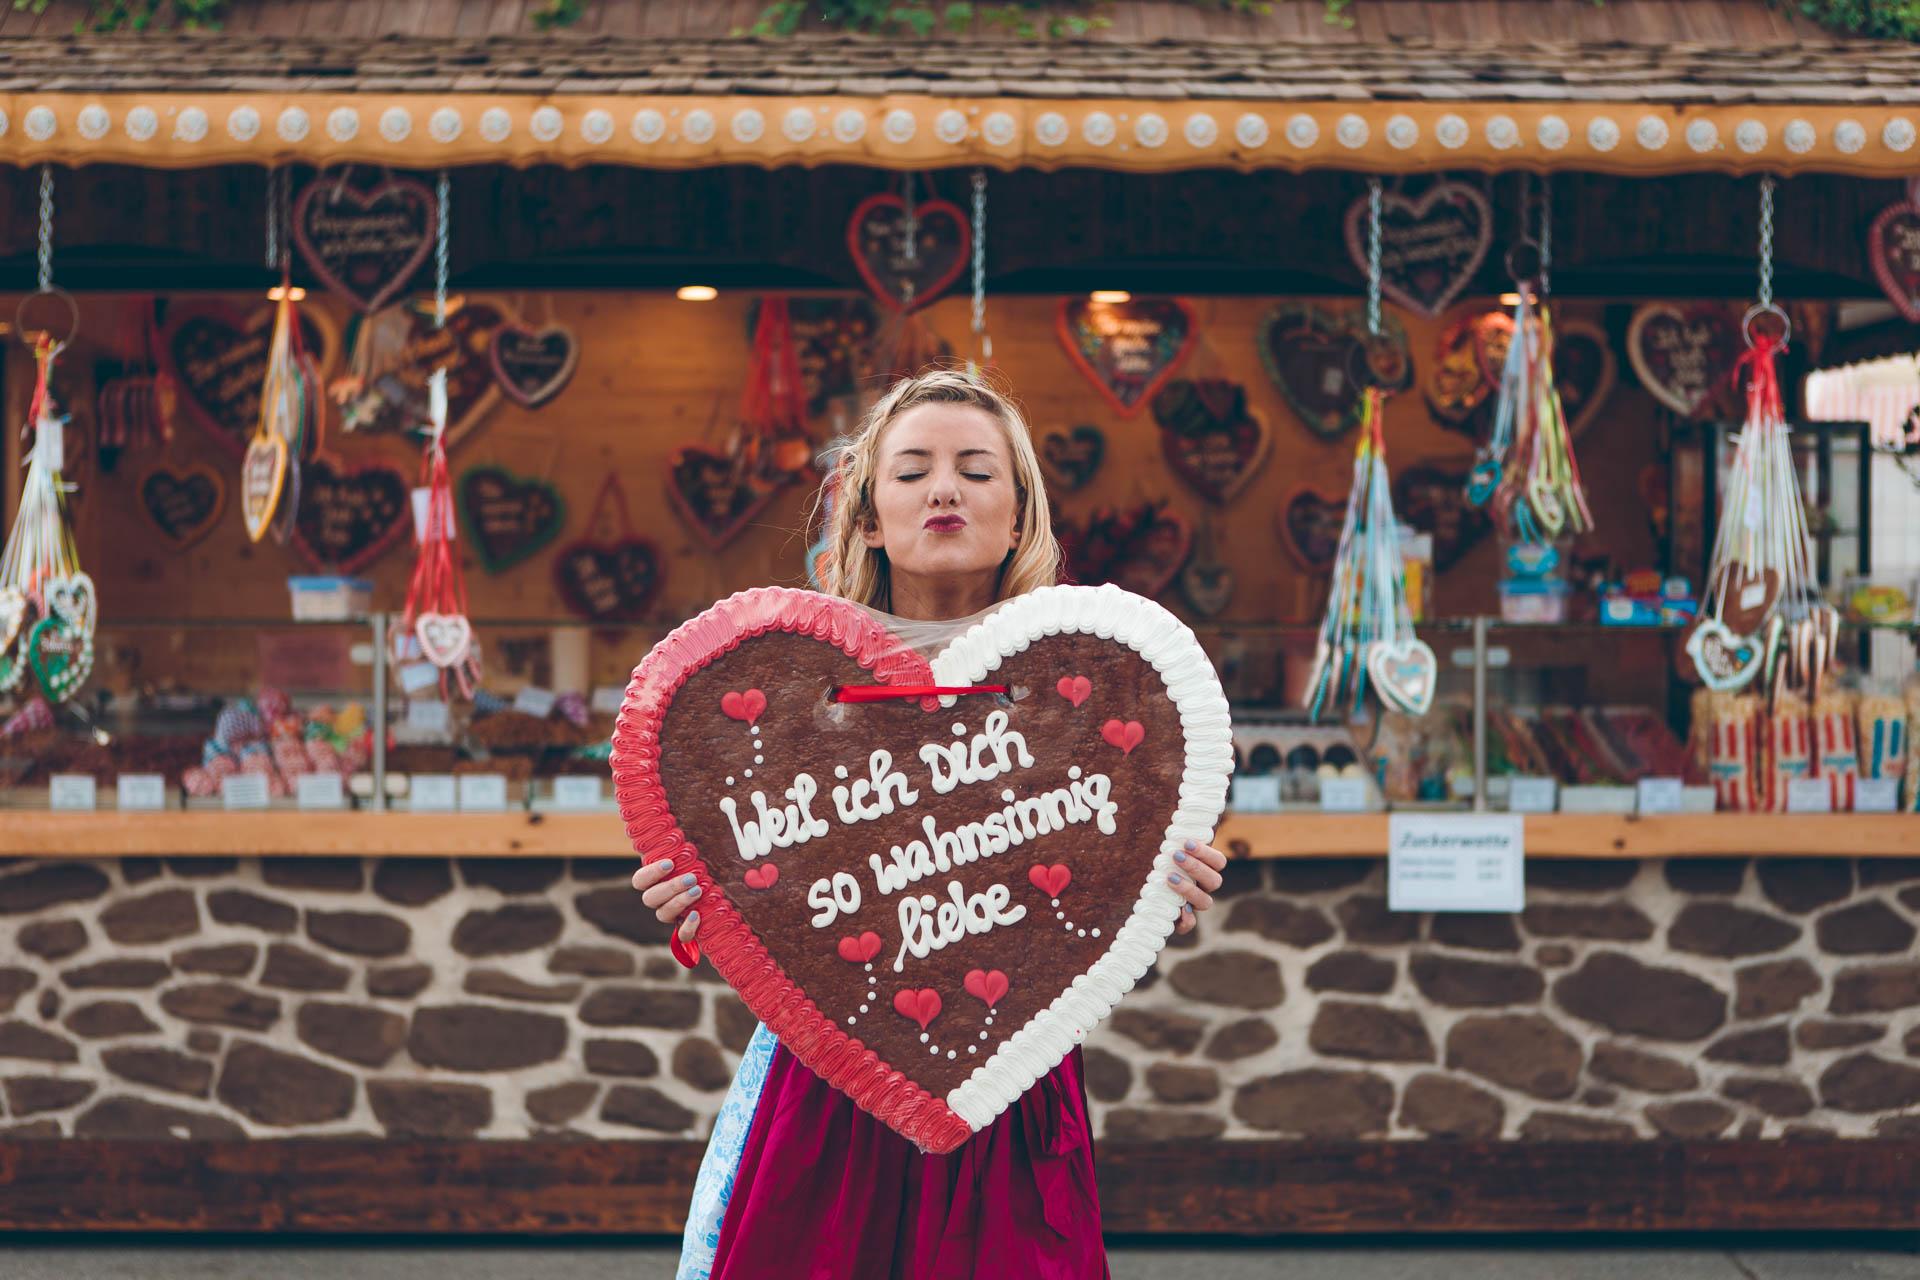 Blonde Frau im Dirndl mit riesigem Lebkuchenherz auf dem Frühlingsfest / Wiesn 2018